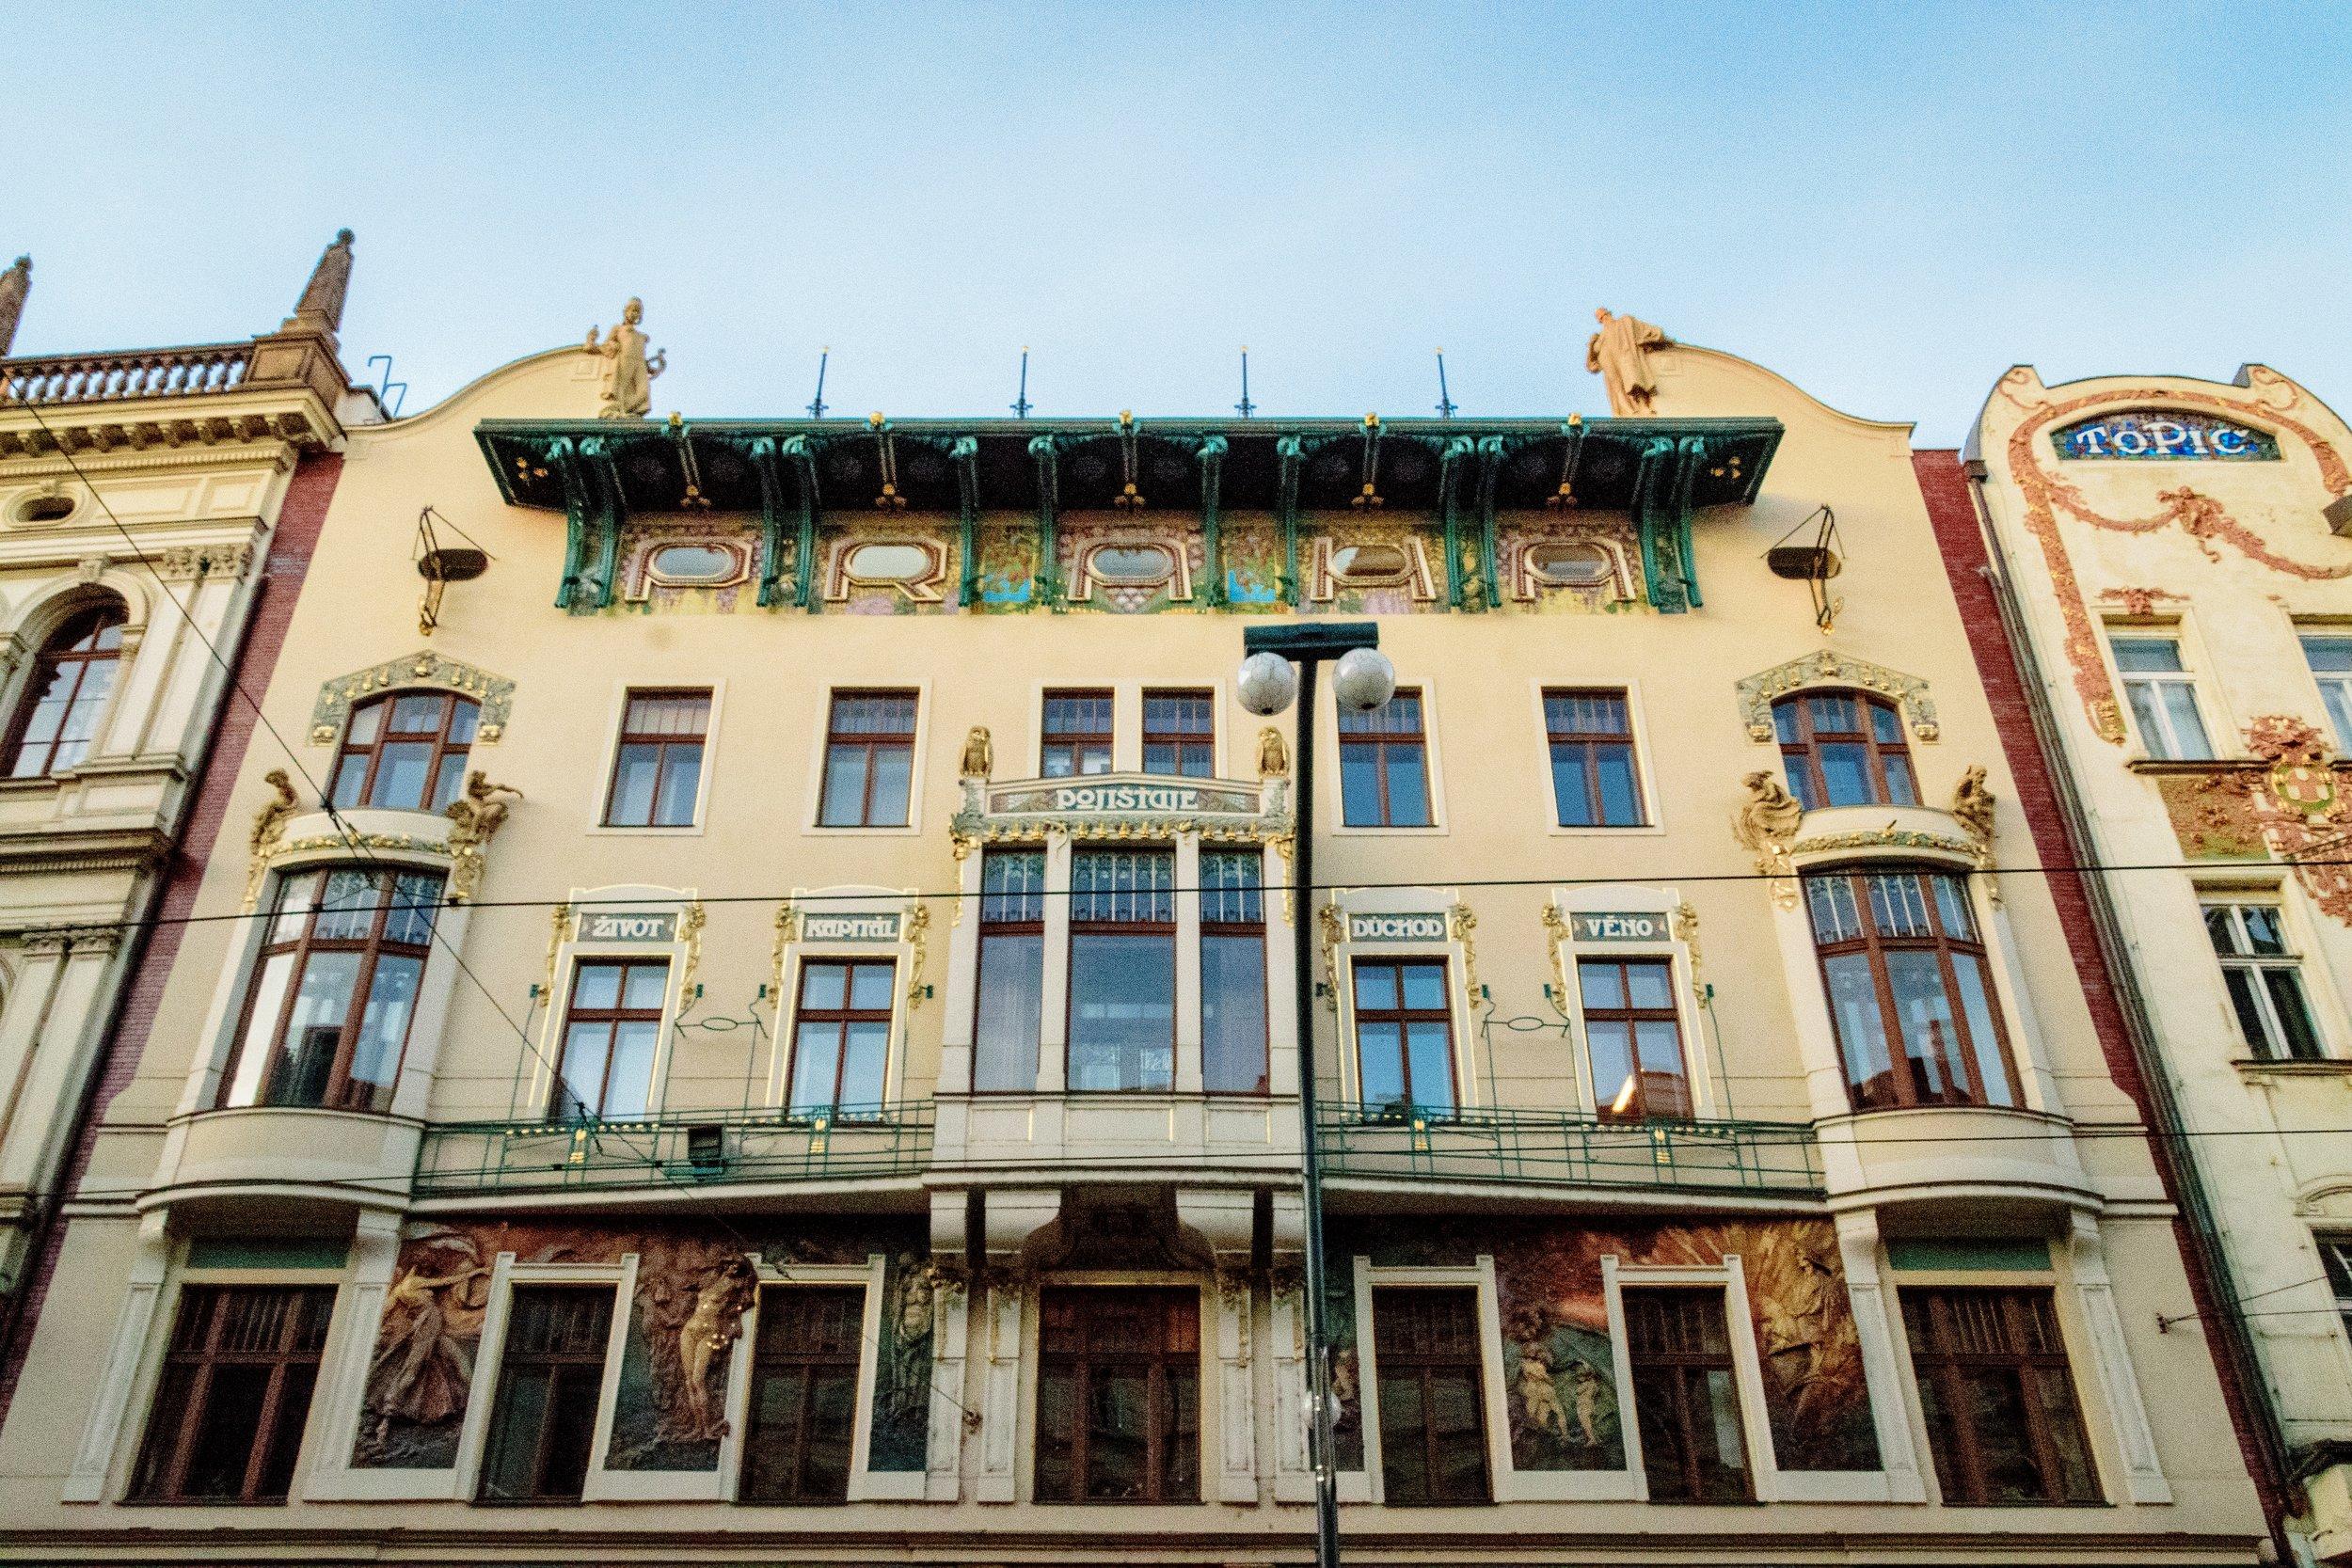 the windows spell 'PRAHA' ('Prague')